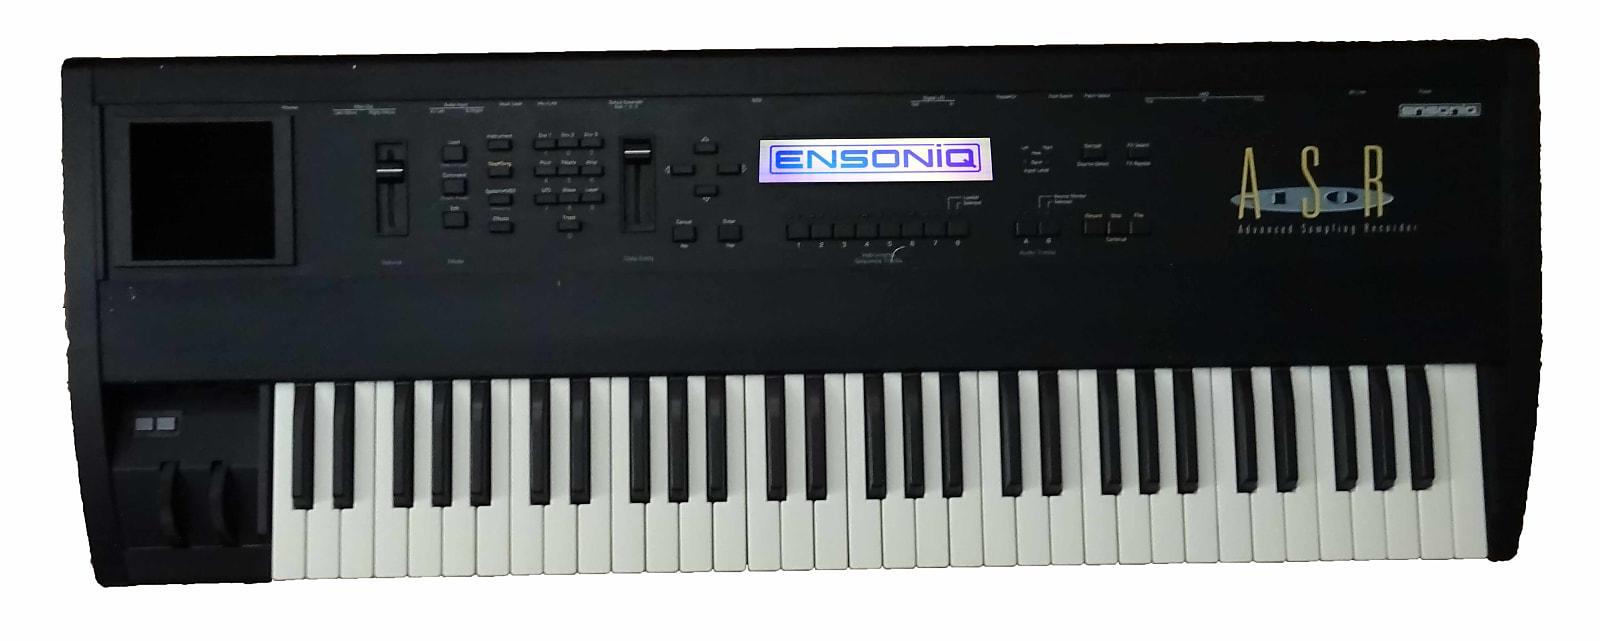 Ensoniq ASR-10 Advanced Sampling Keyboard with Rare Purple Screen